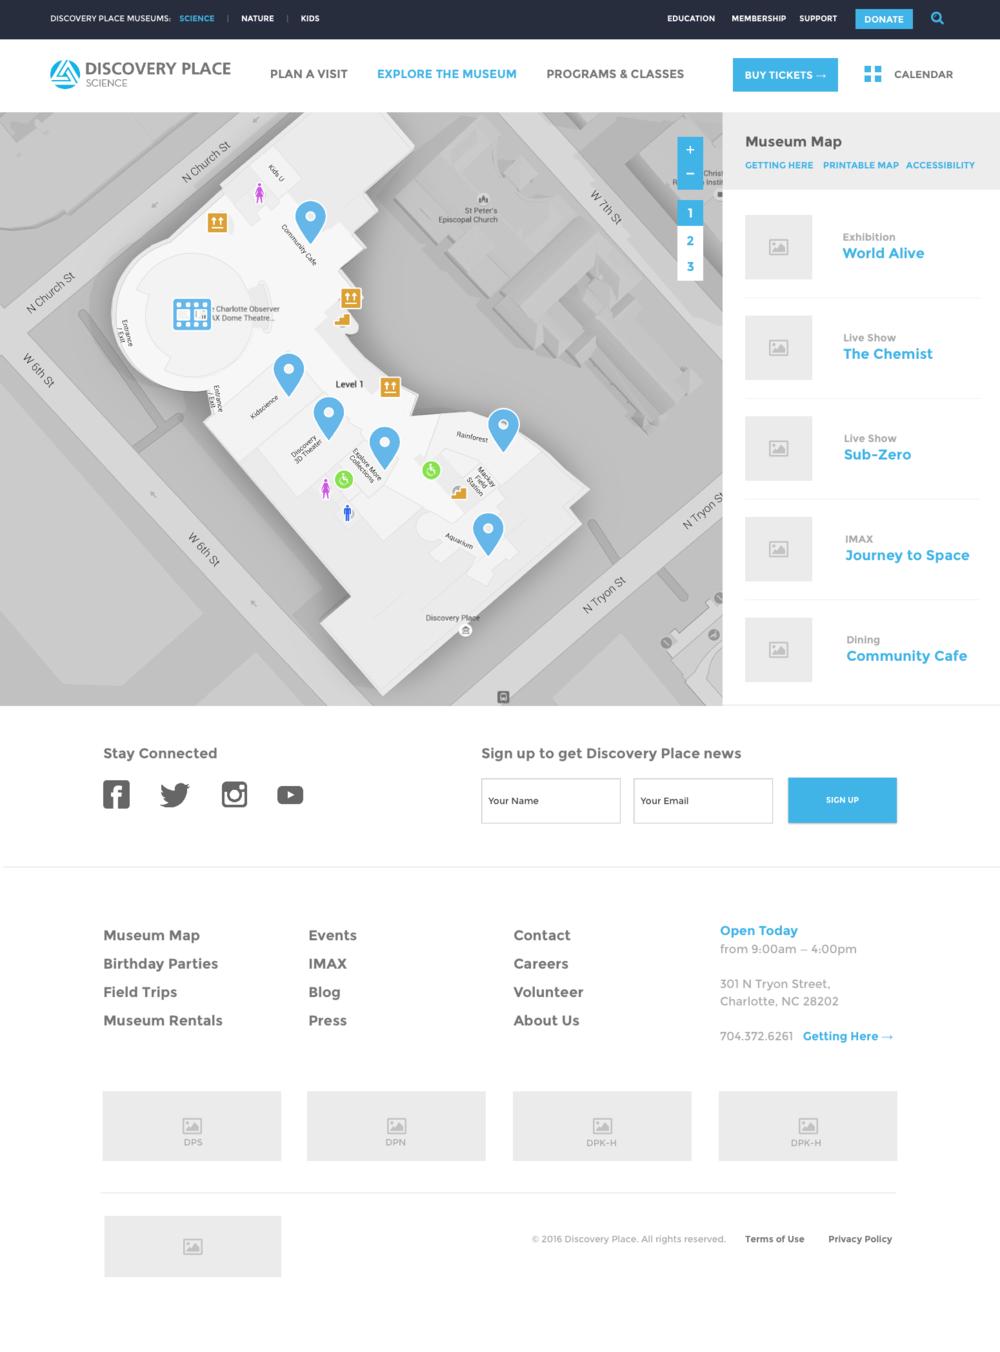 11-Museum-Map-0-Wide-website-52521306-1468250116.png